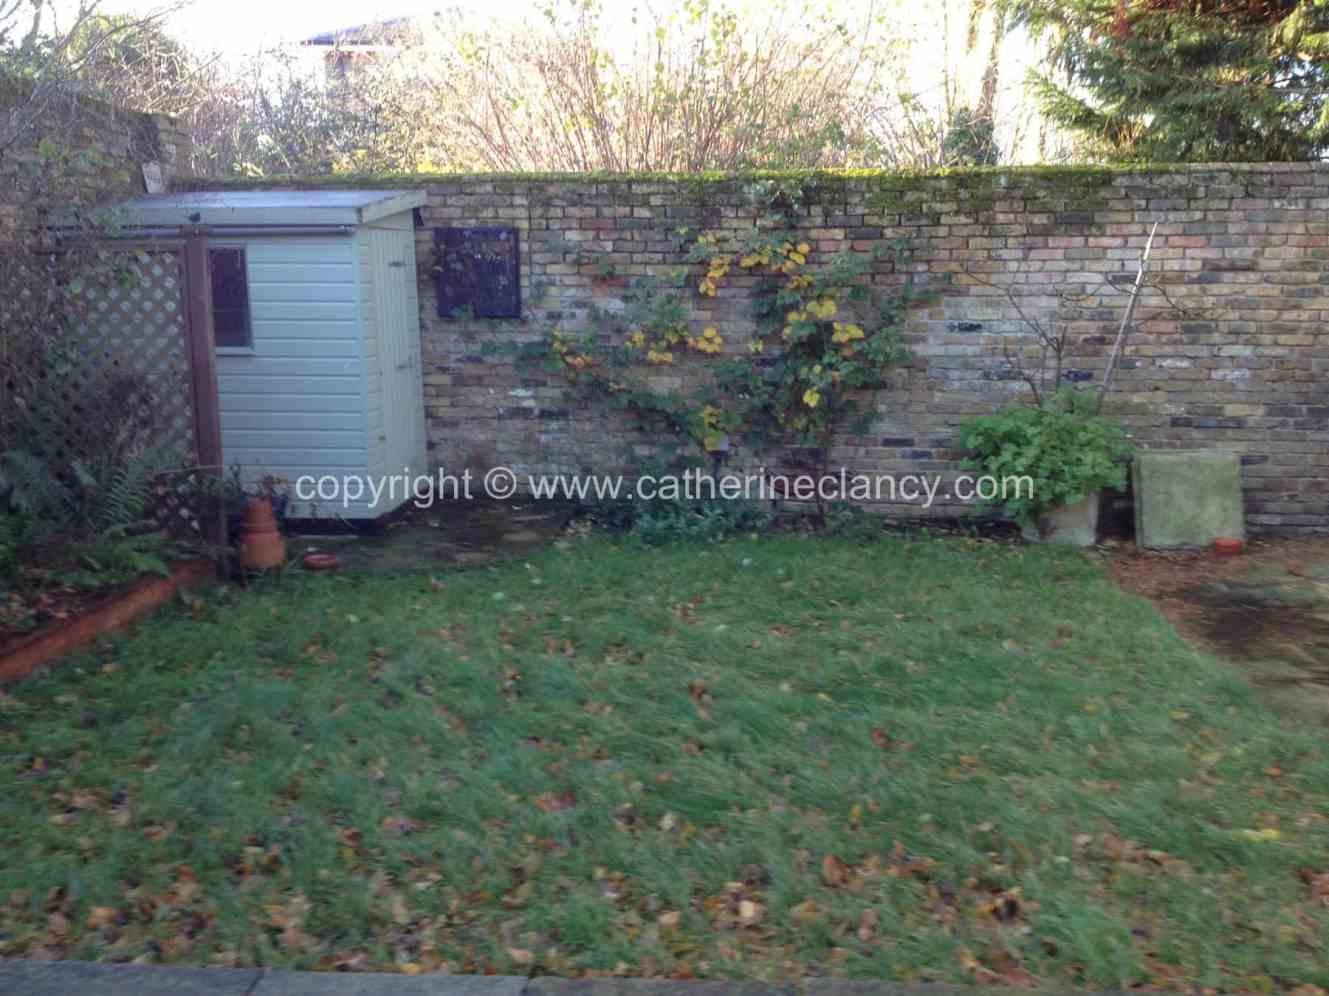 blackheath-courtyard-14